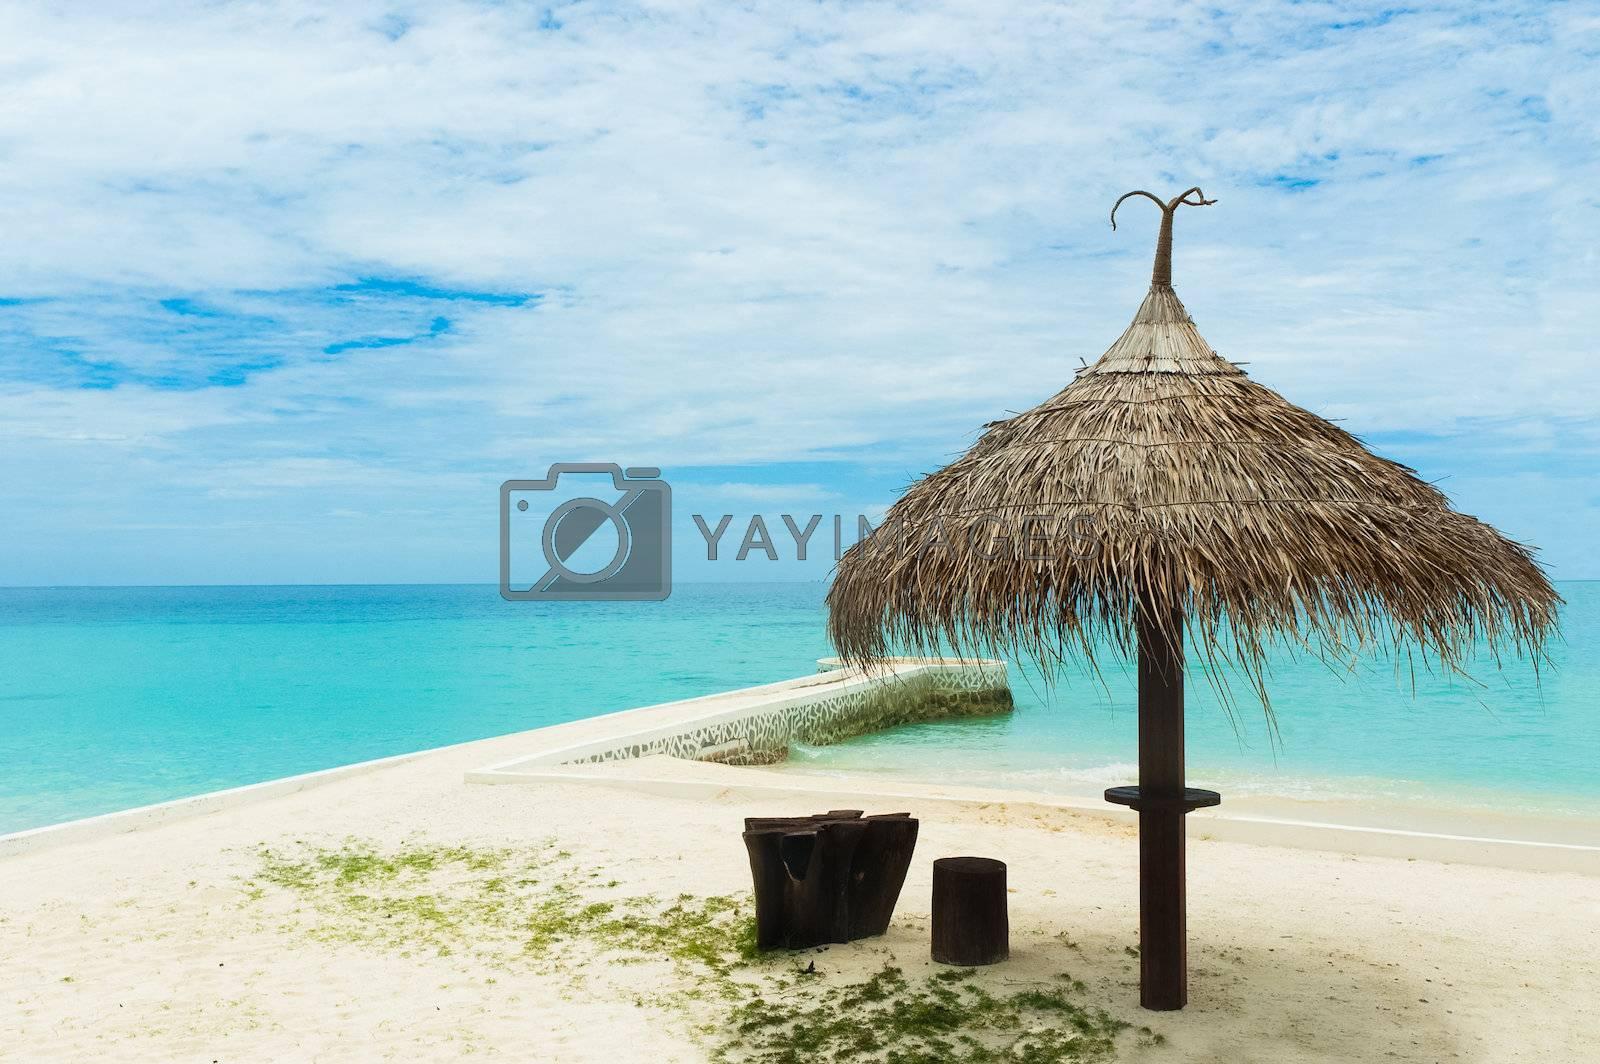 Umbrella on a tropical beach